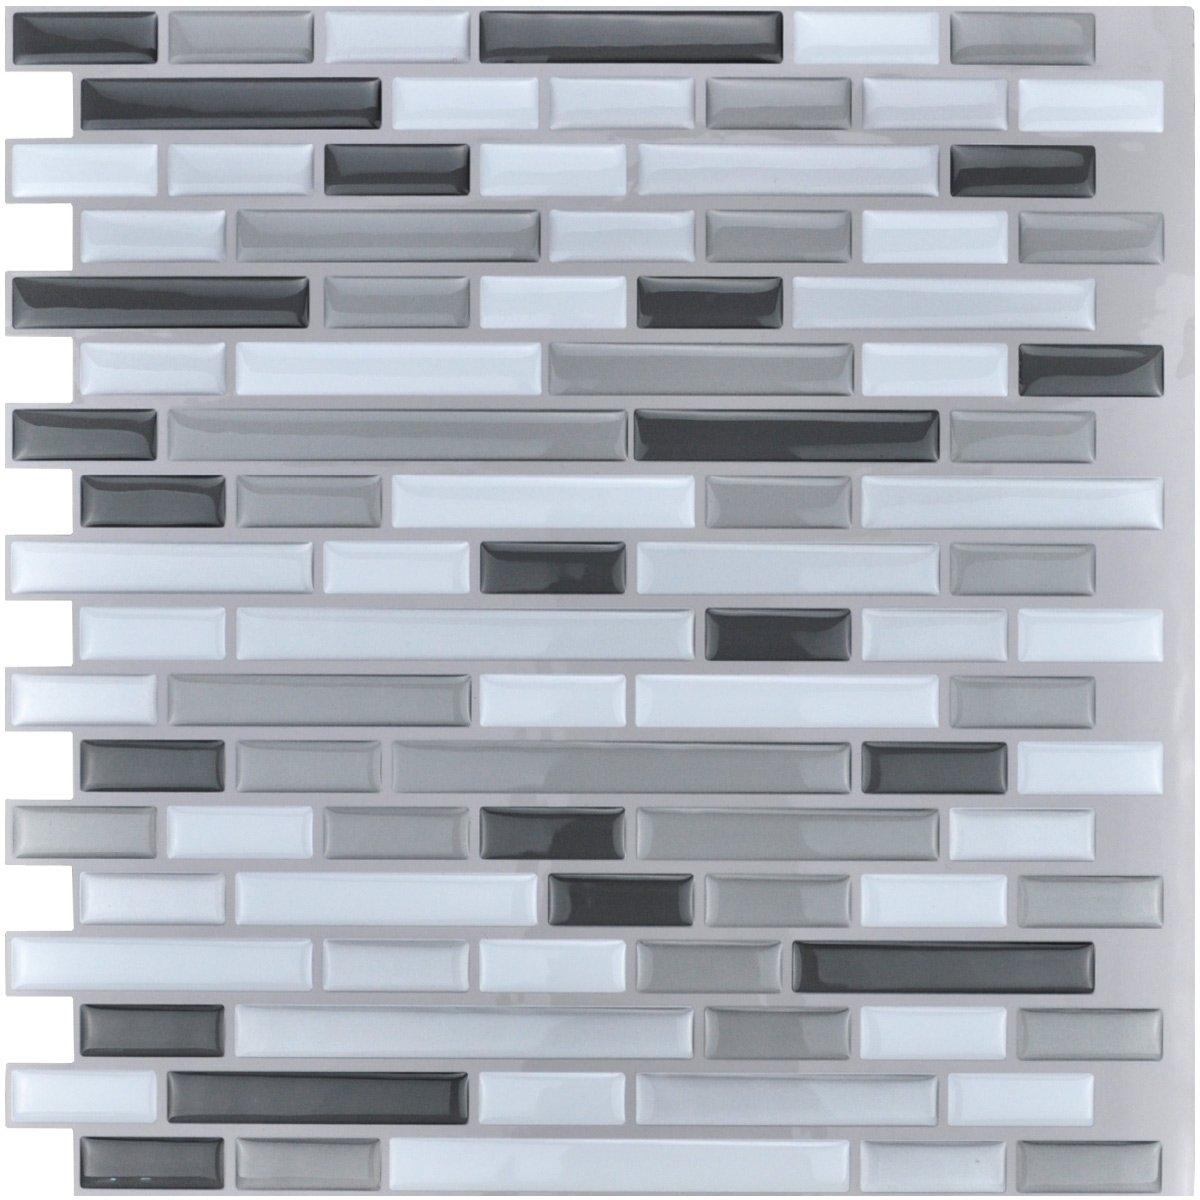 Art3d 12'' x 12'' Peel and Stick Tile Kitchen Backsplash Sticker Gray Brick (6 Tiles)